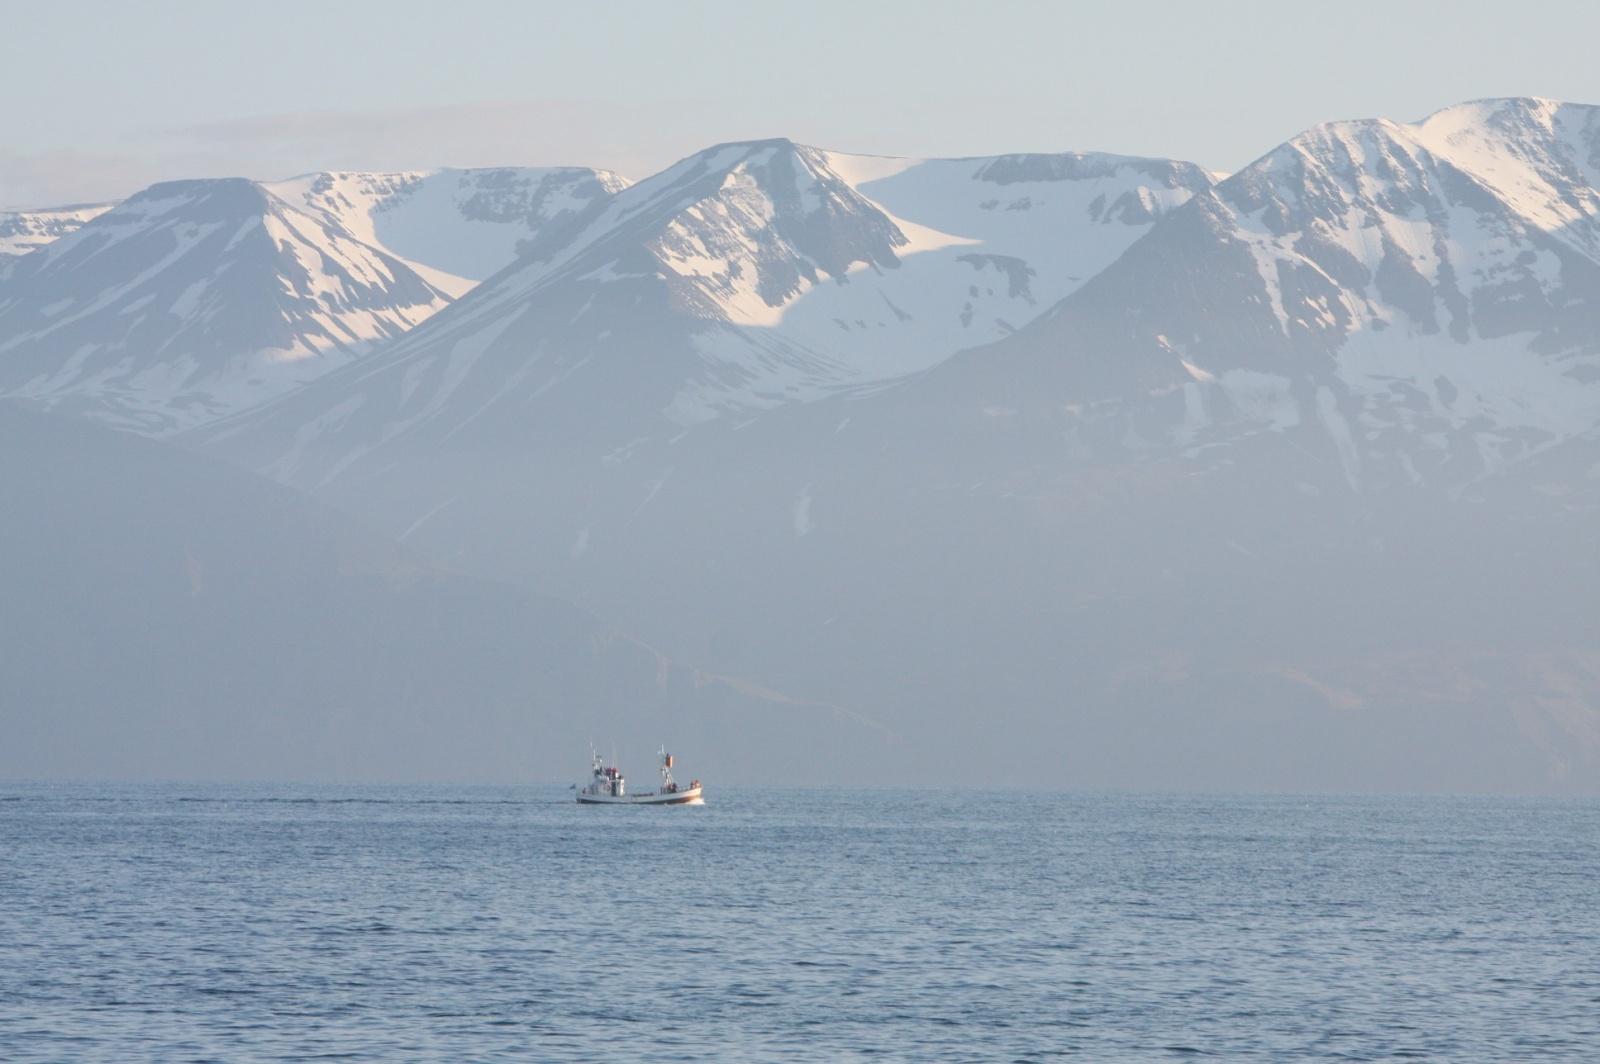 A lone boat